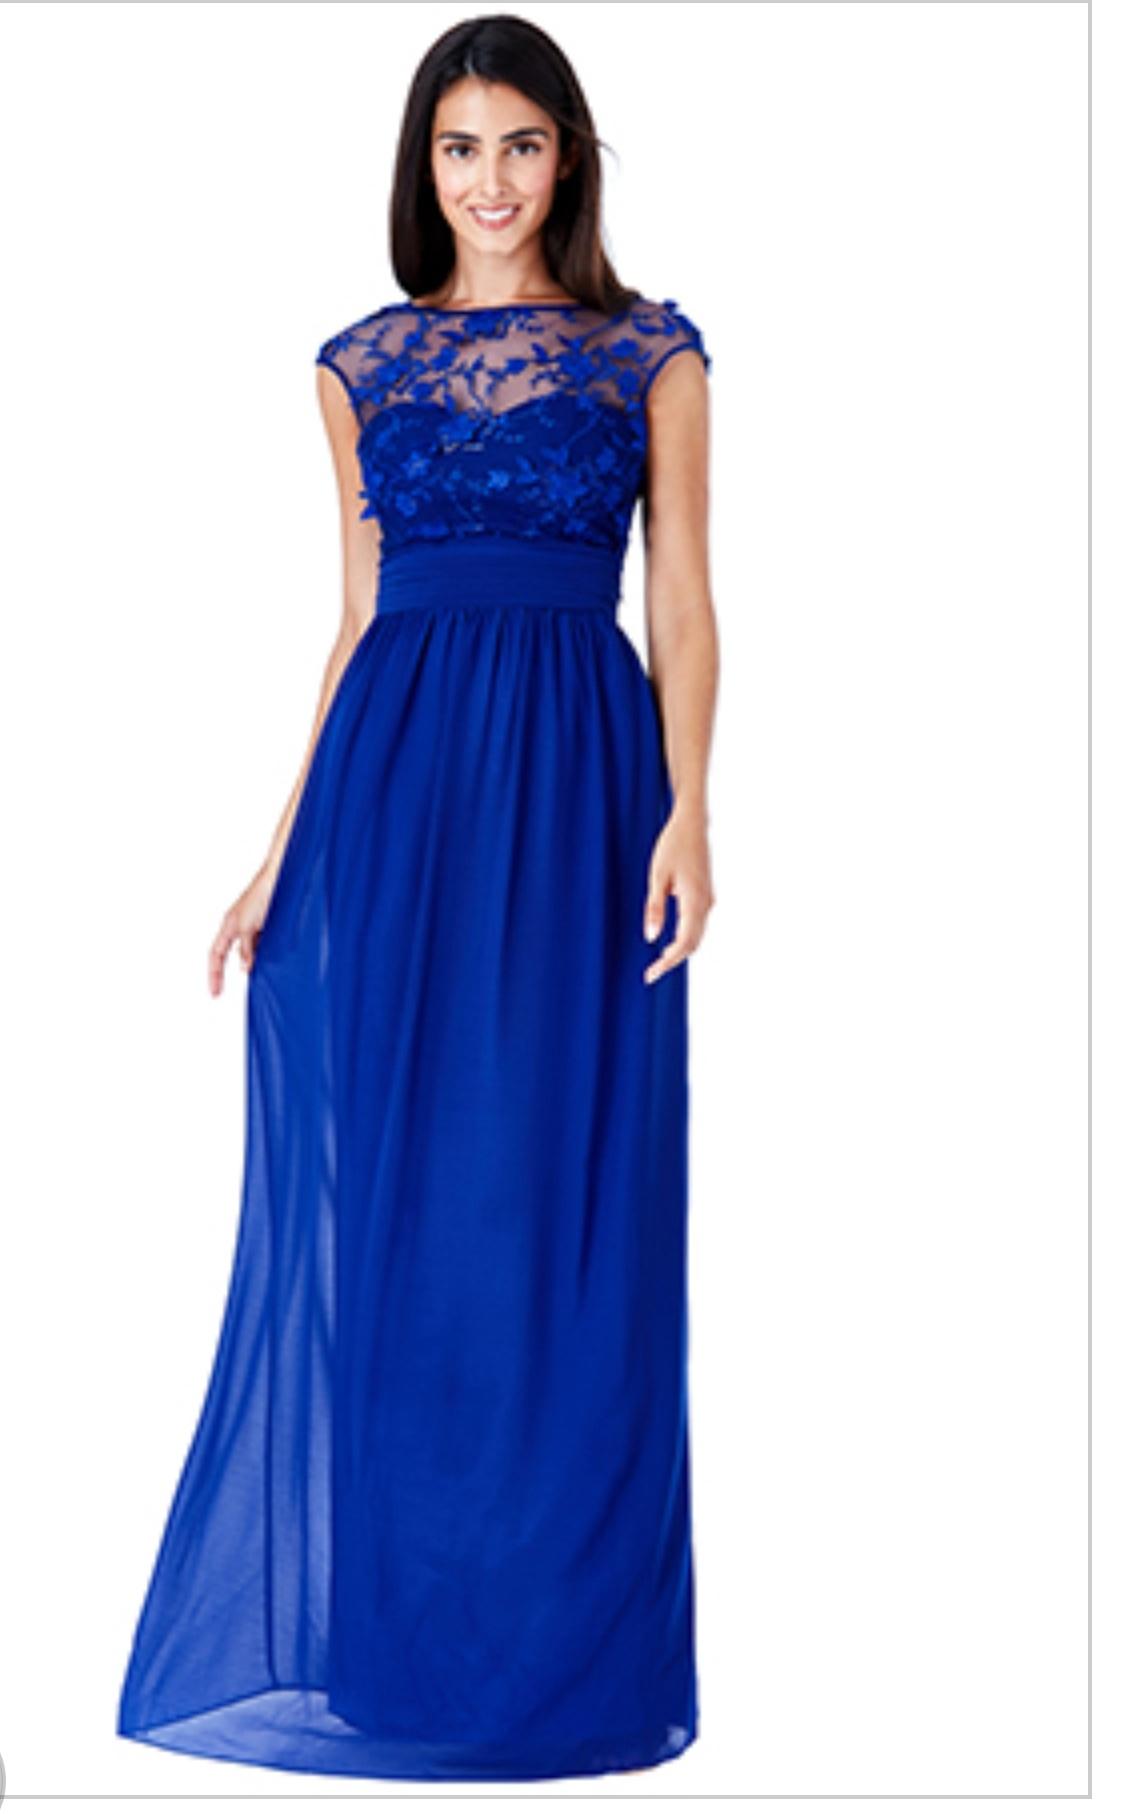 Blue floral chiffon floor length dress